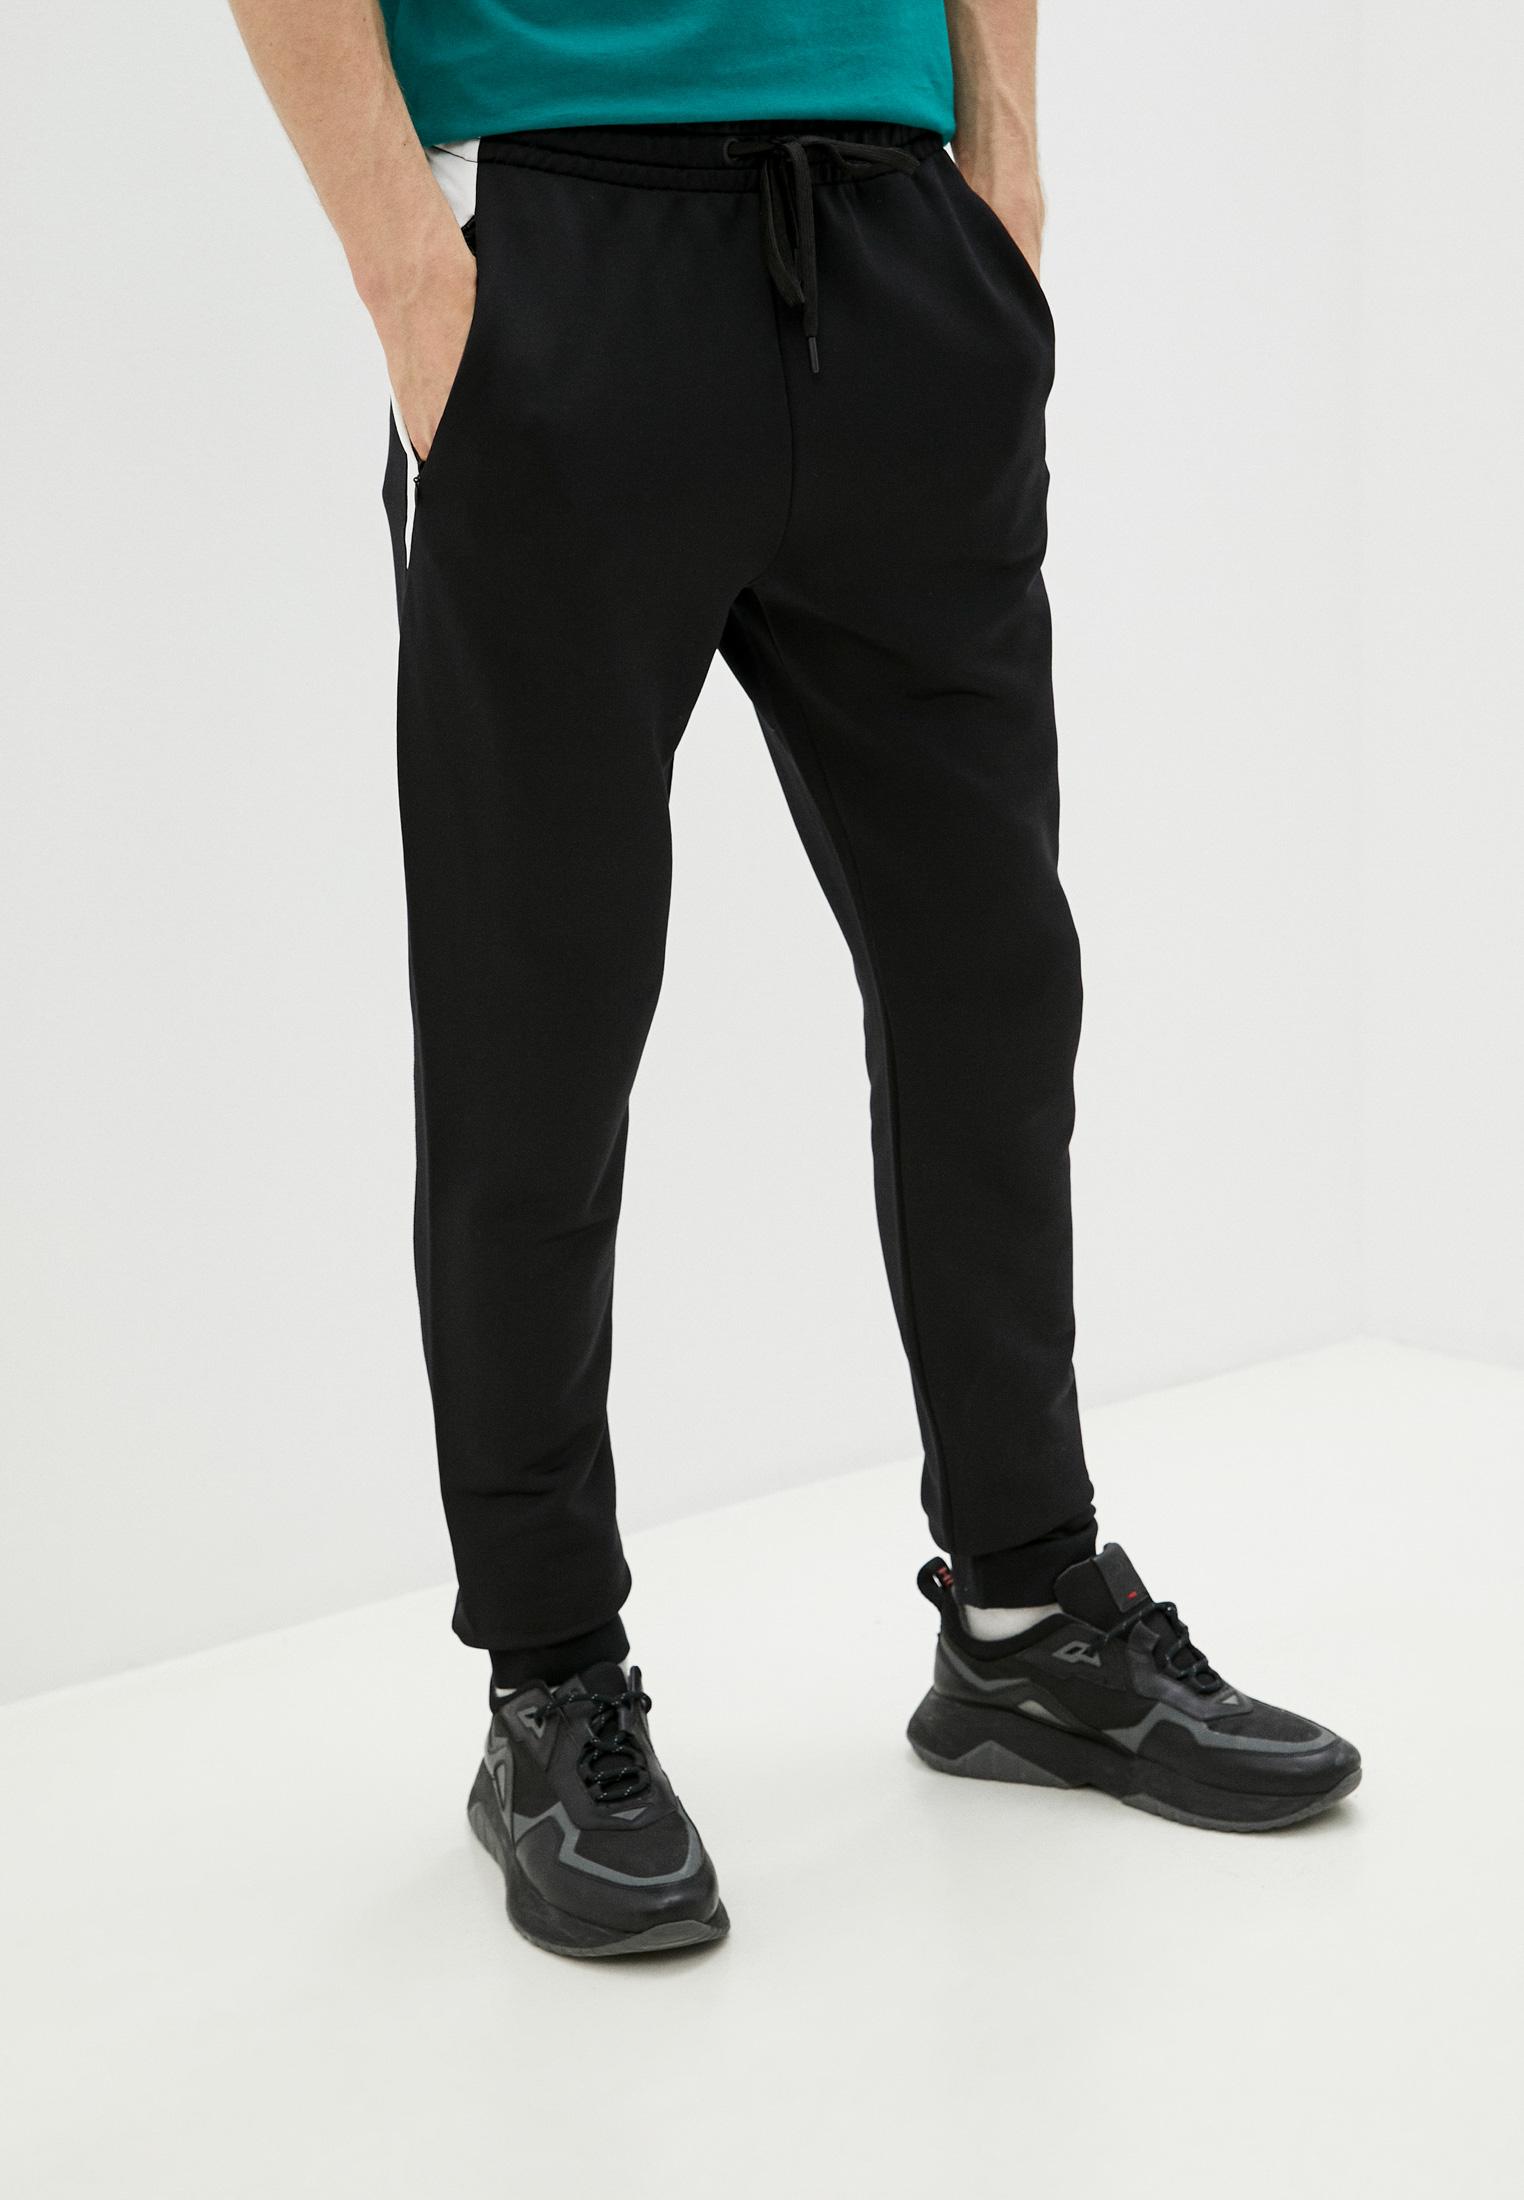 Мужские спортивные брюки Bikkembergs (Биккембергс) C 1 212 01 M 4296